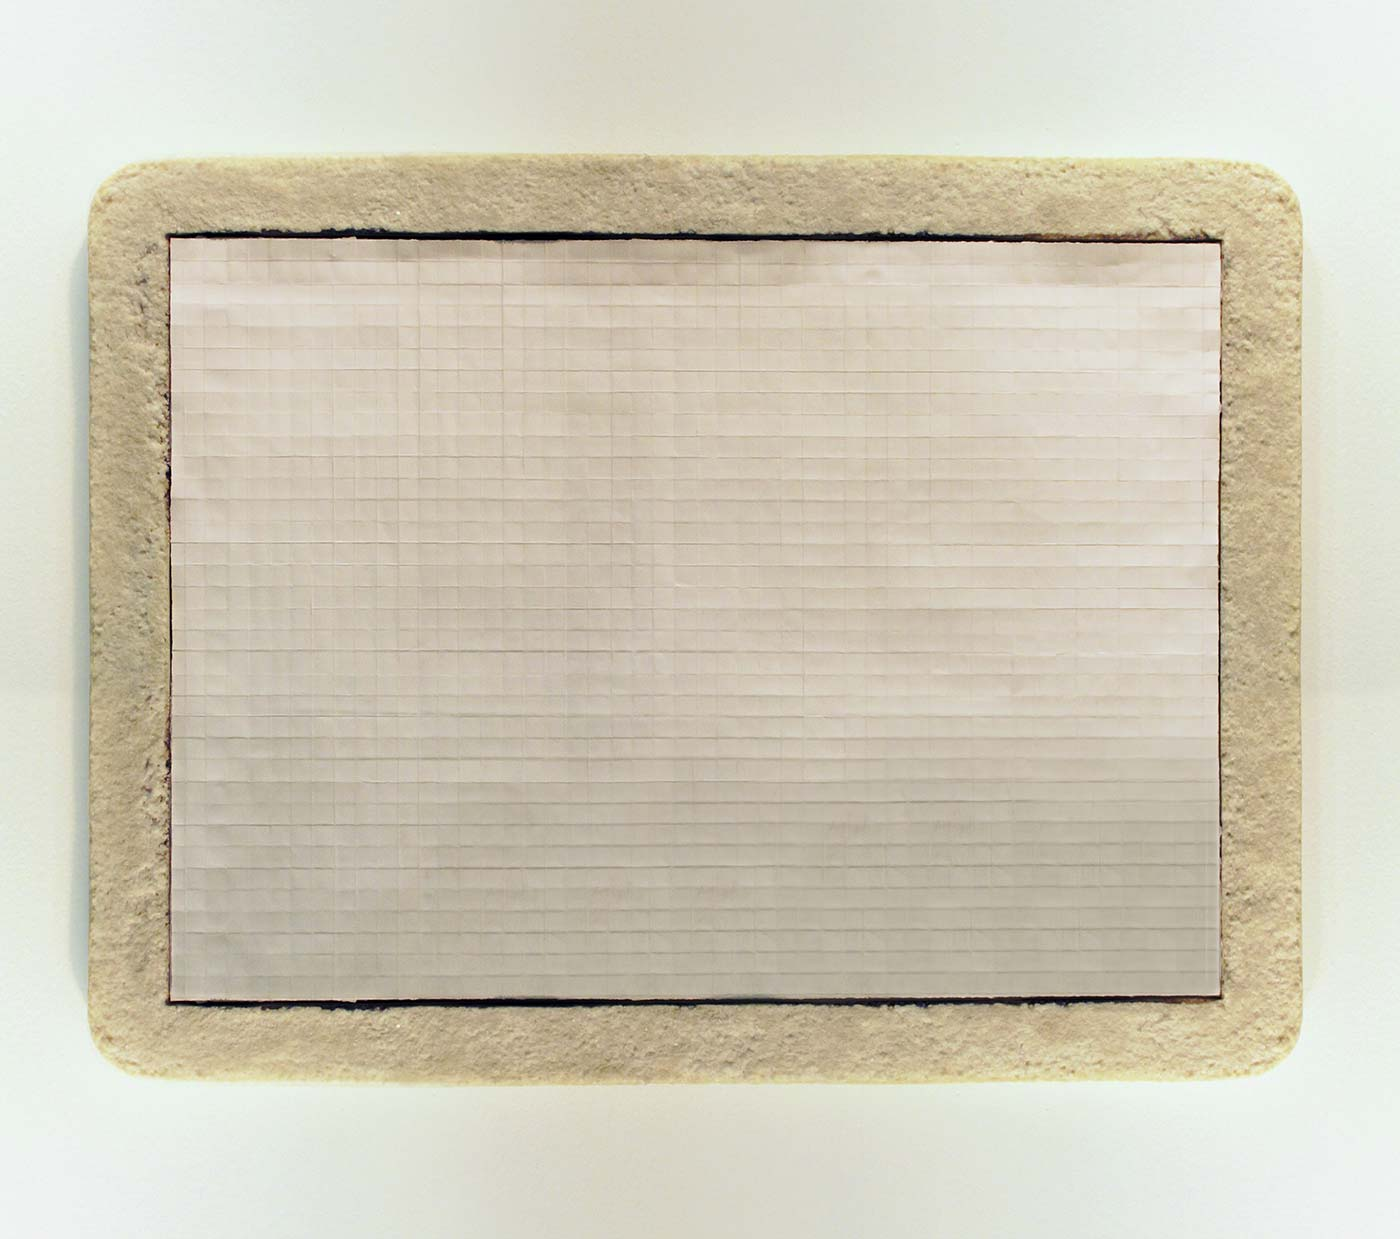 paper, frame on sea salt